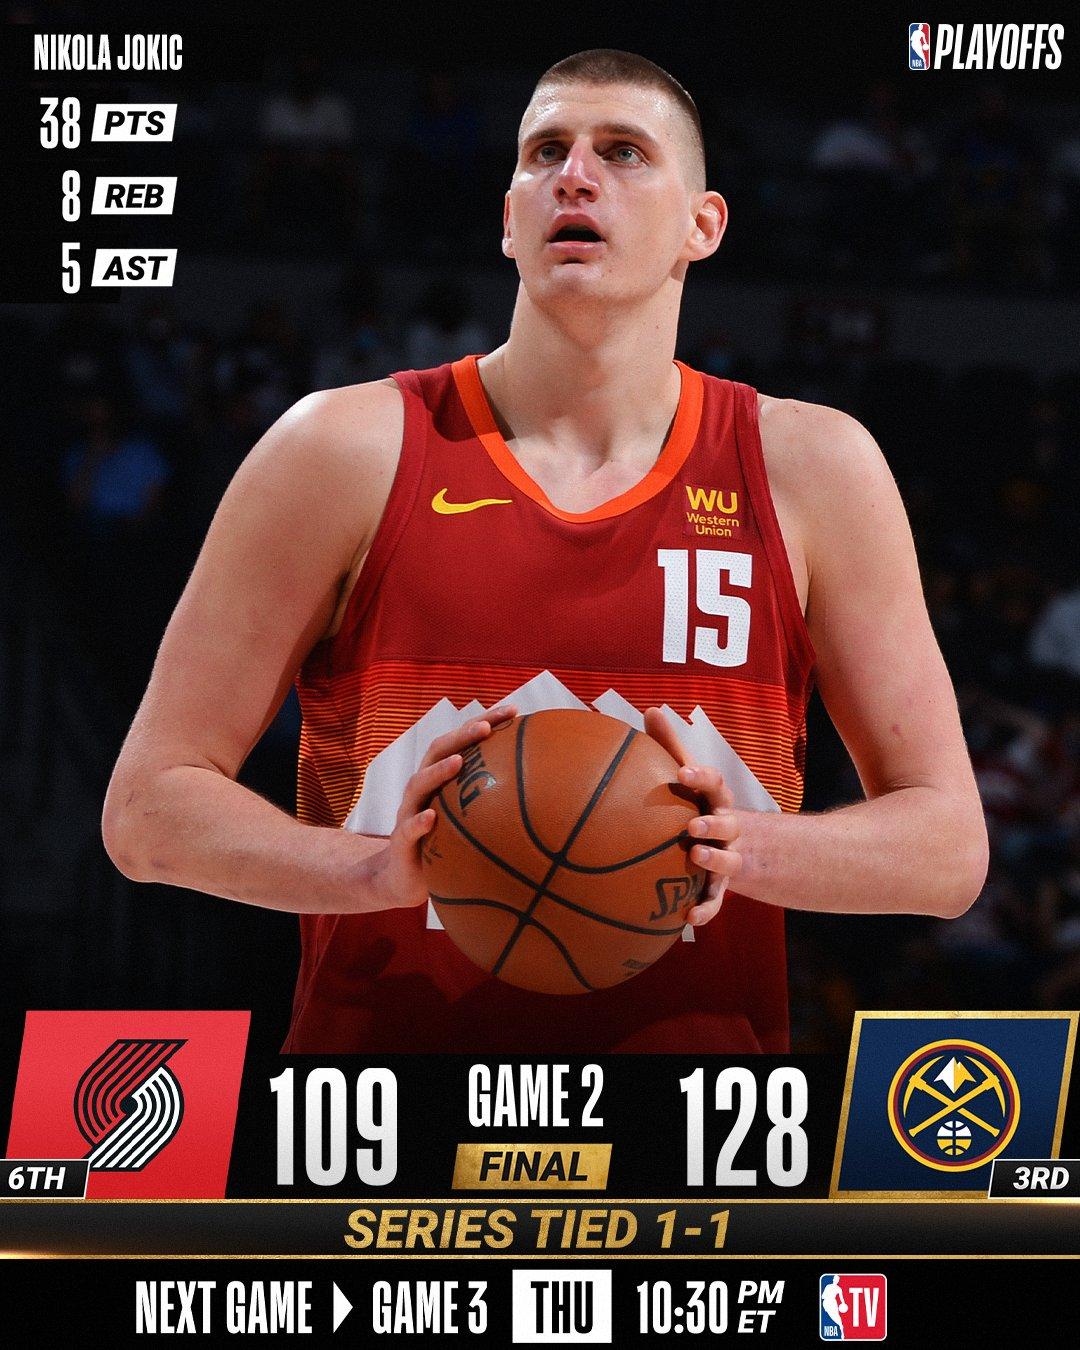 25-5-2